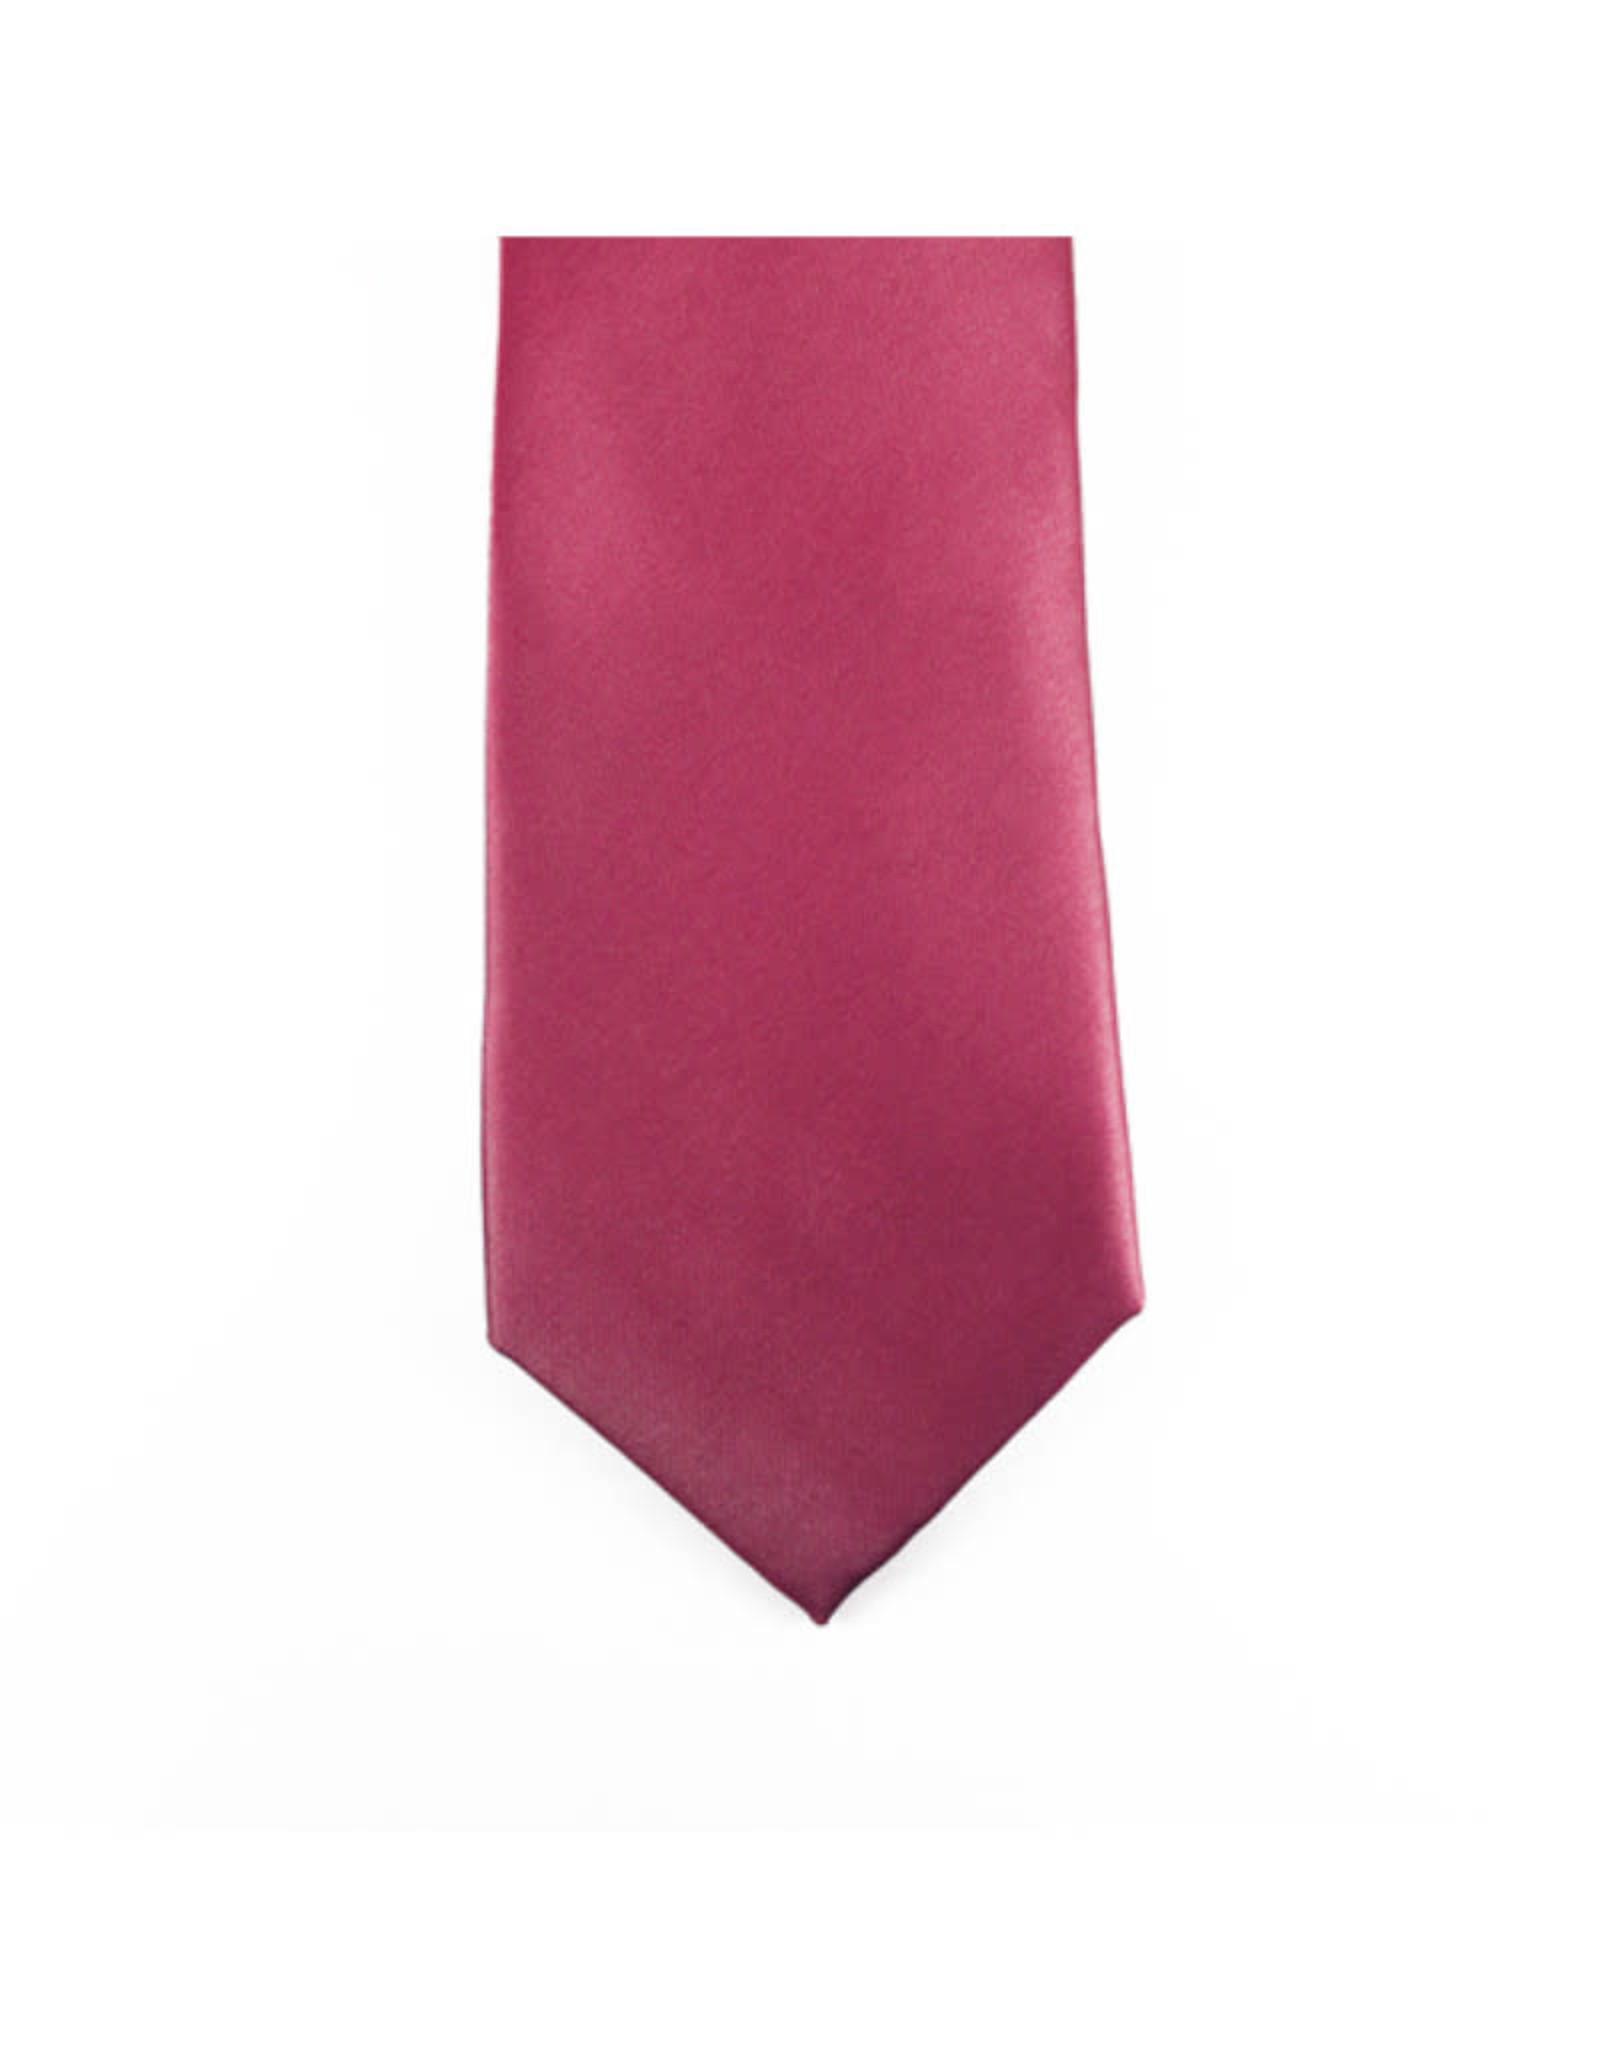 Knotz M100 Solid Tie 41-70